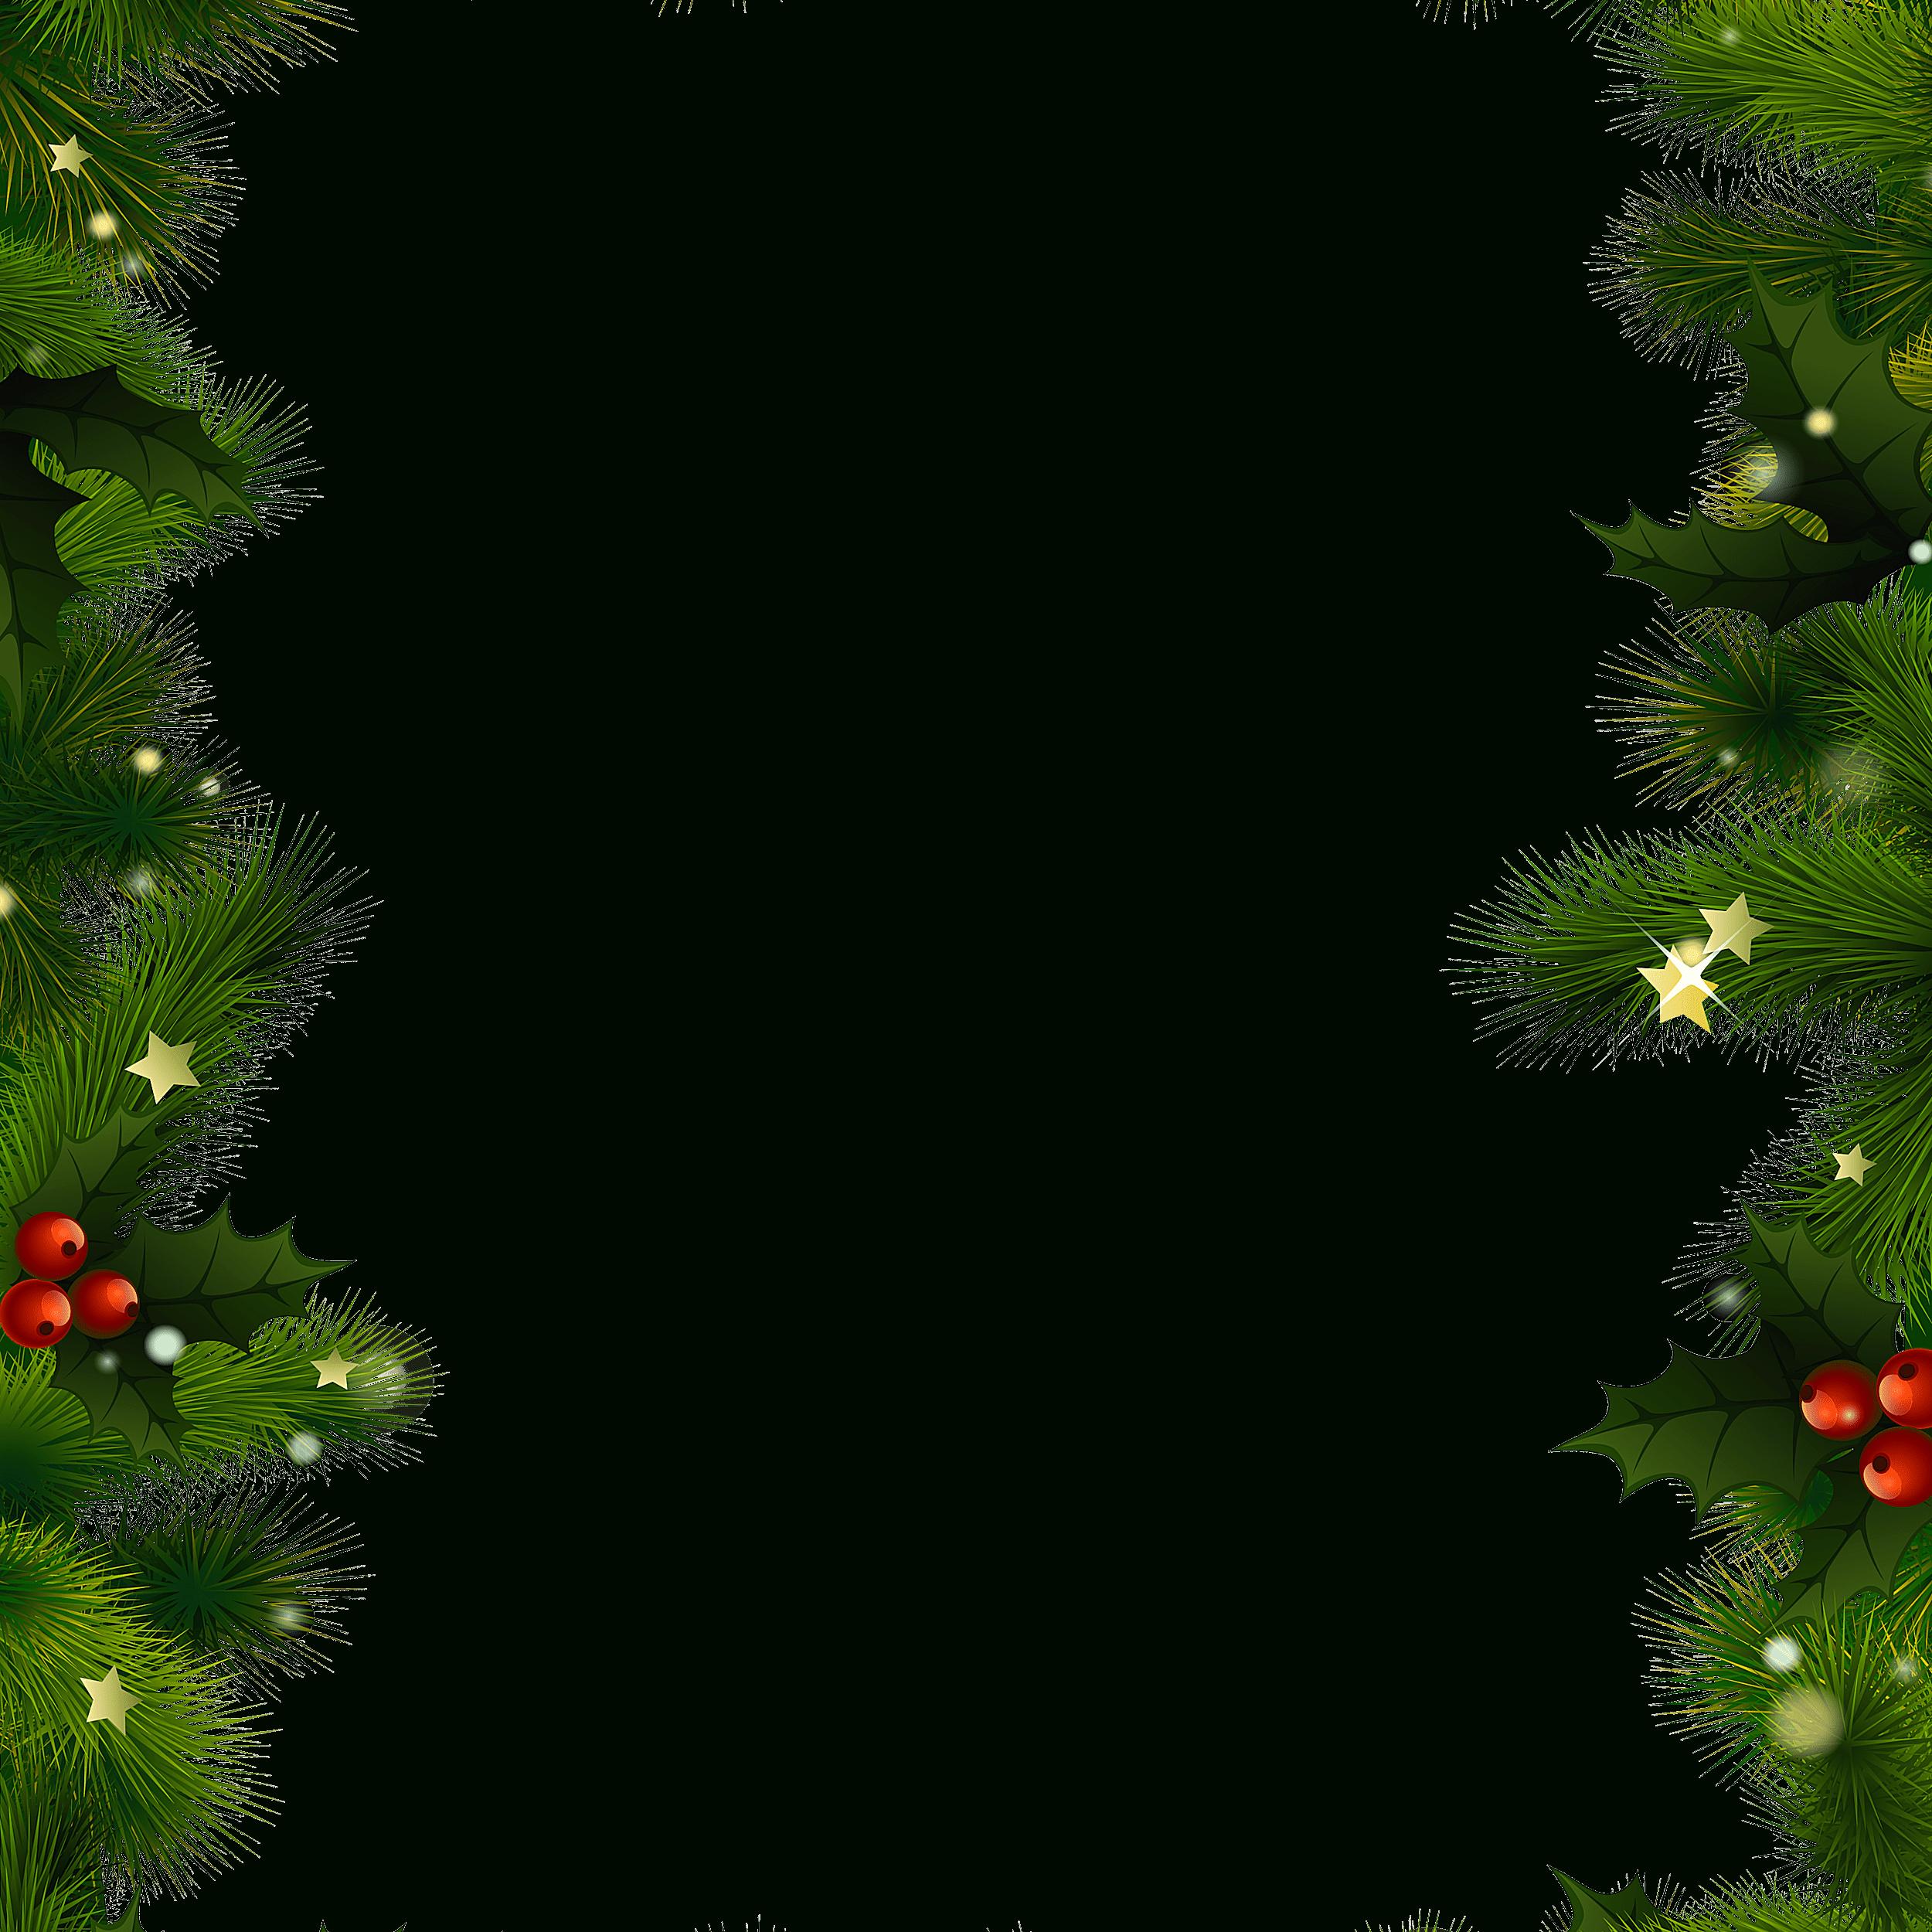 Free Christmas Borders And Frames - Free Printable Christmas Frames And Borders